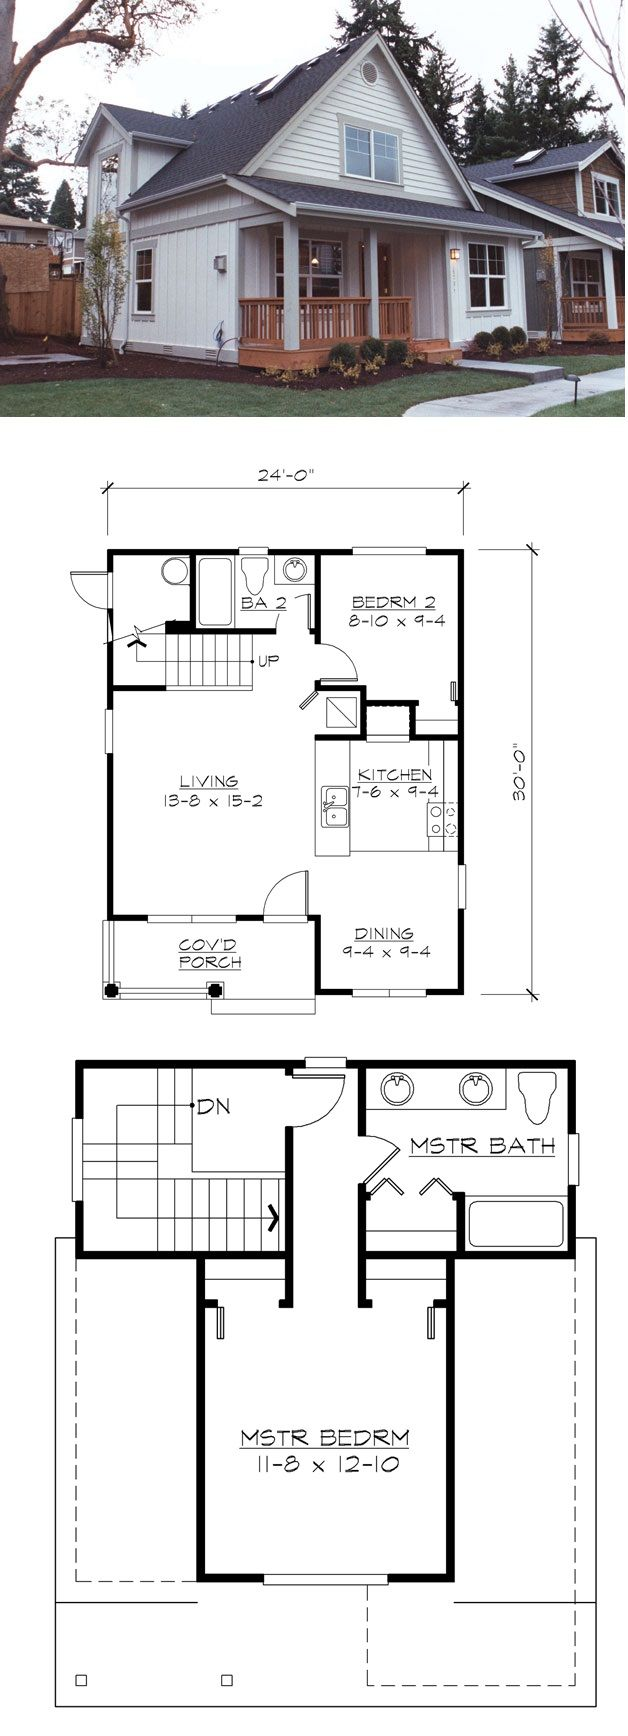 757 best smaller house plans images on Pinterest | House floor plans ...